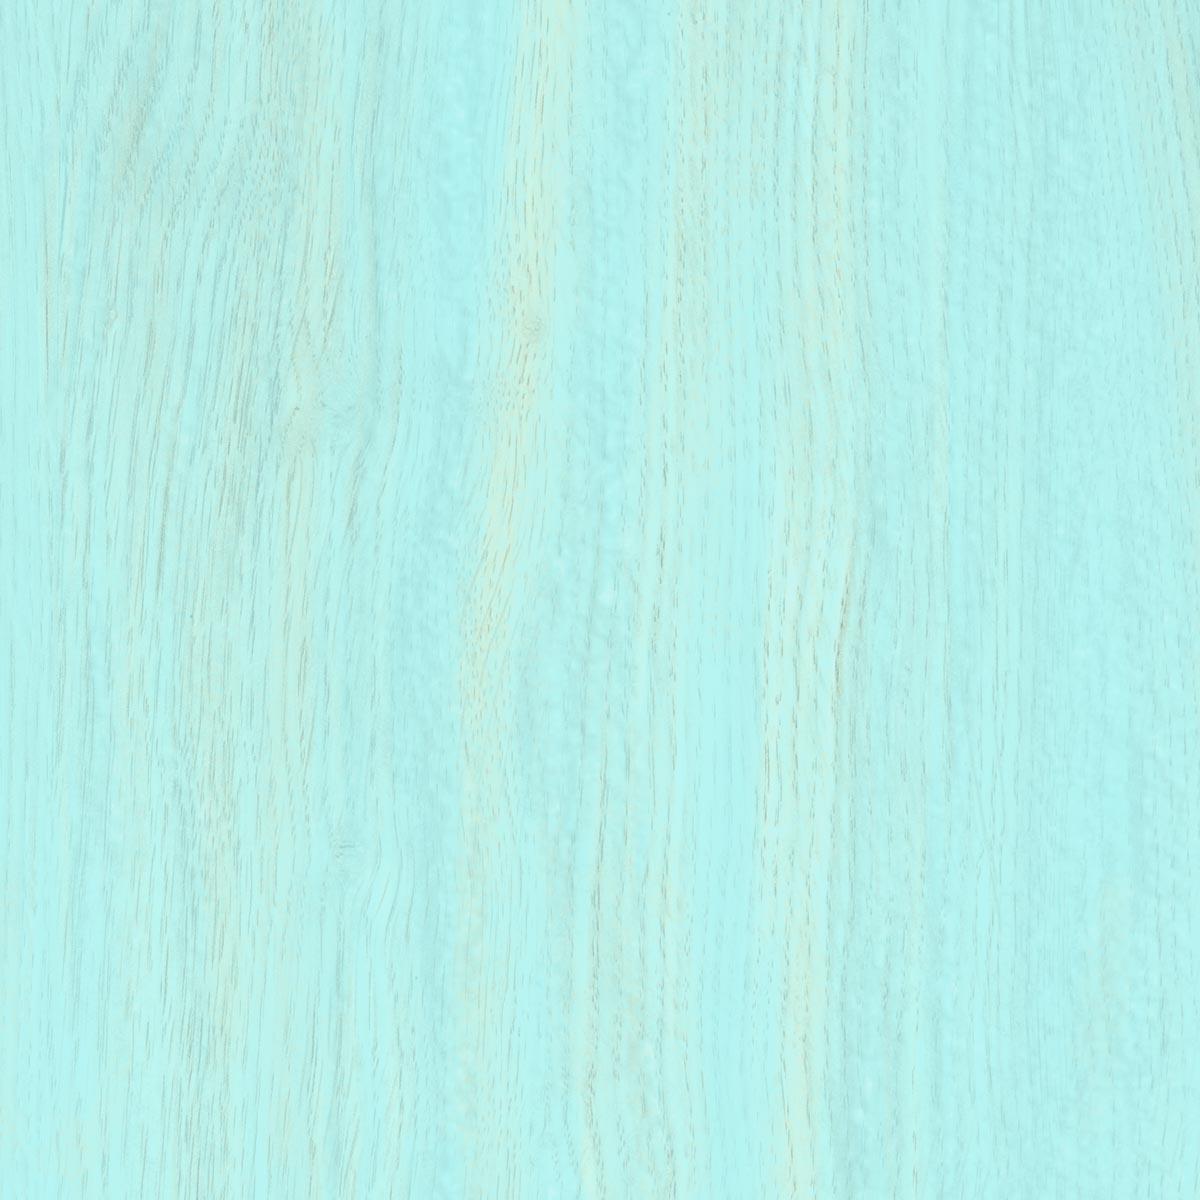 FolkArt ® Pickling Wash™ - Sea Glassl, 2 oz. - 5820